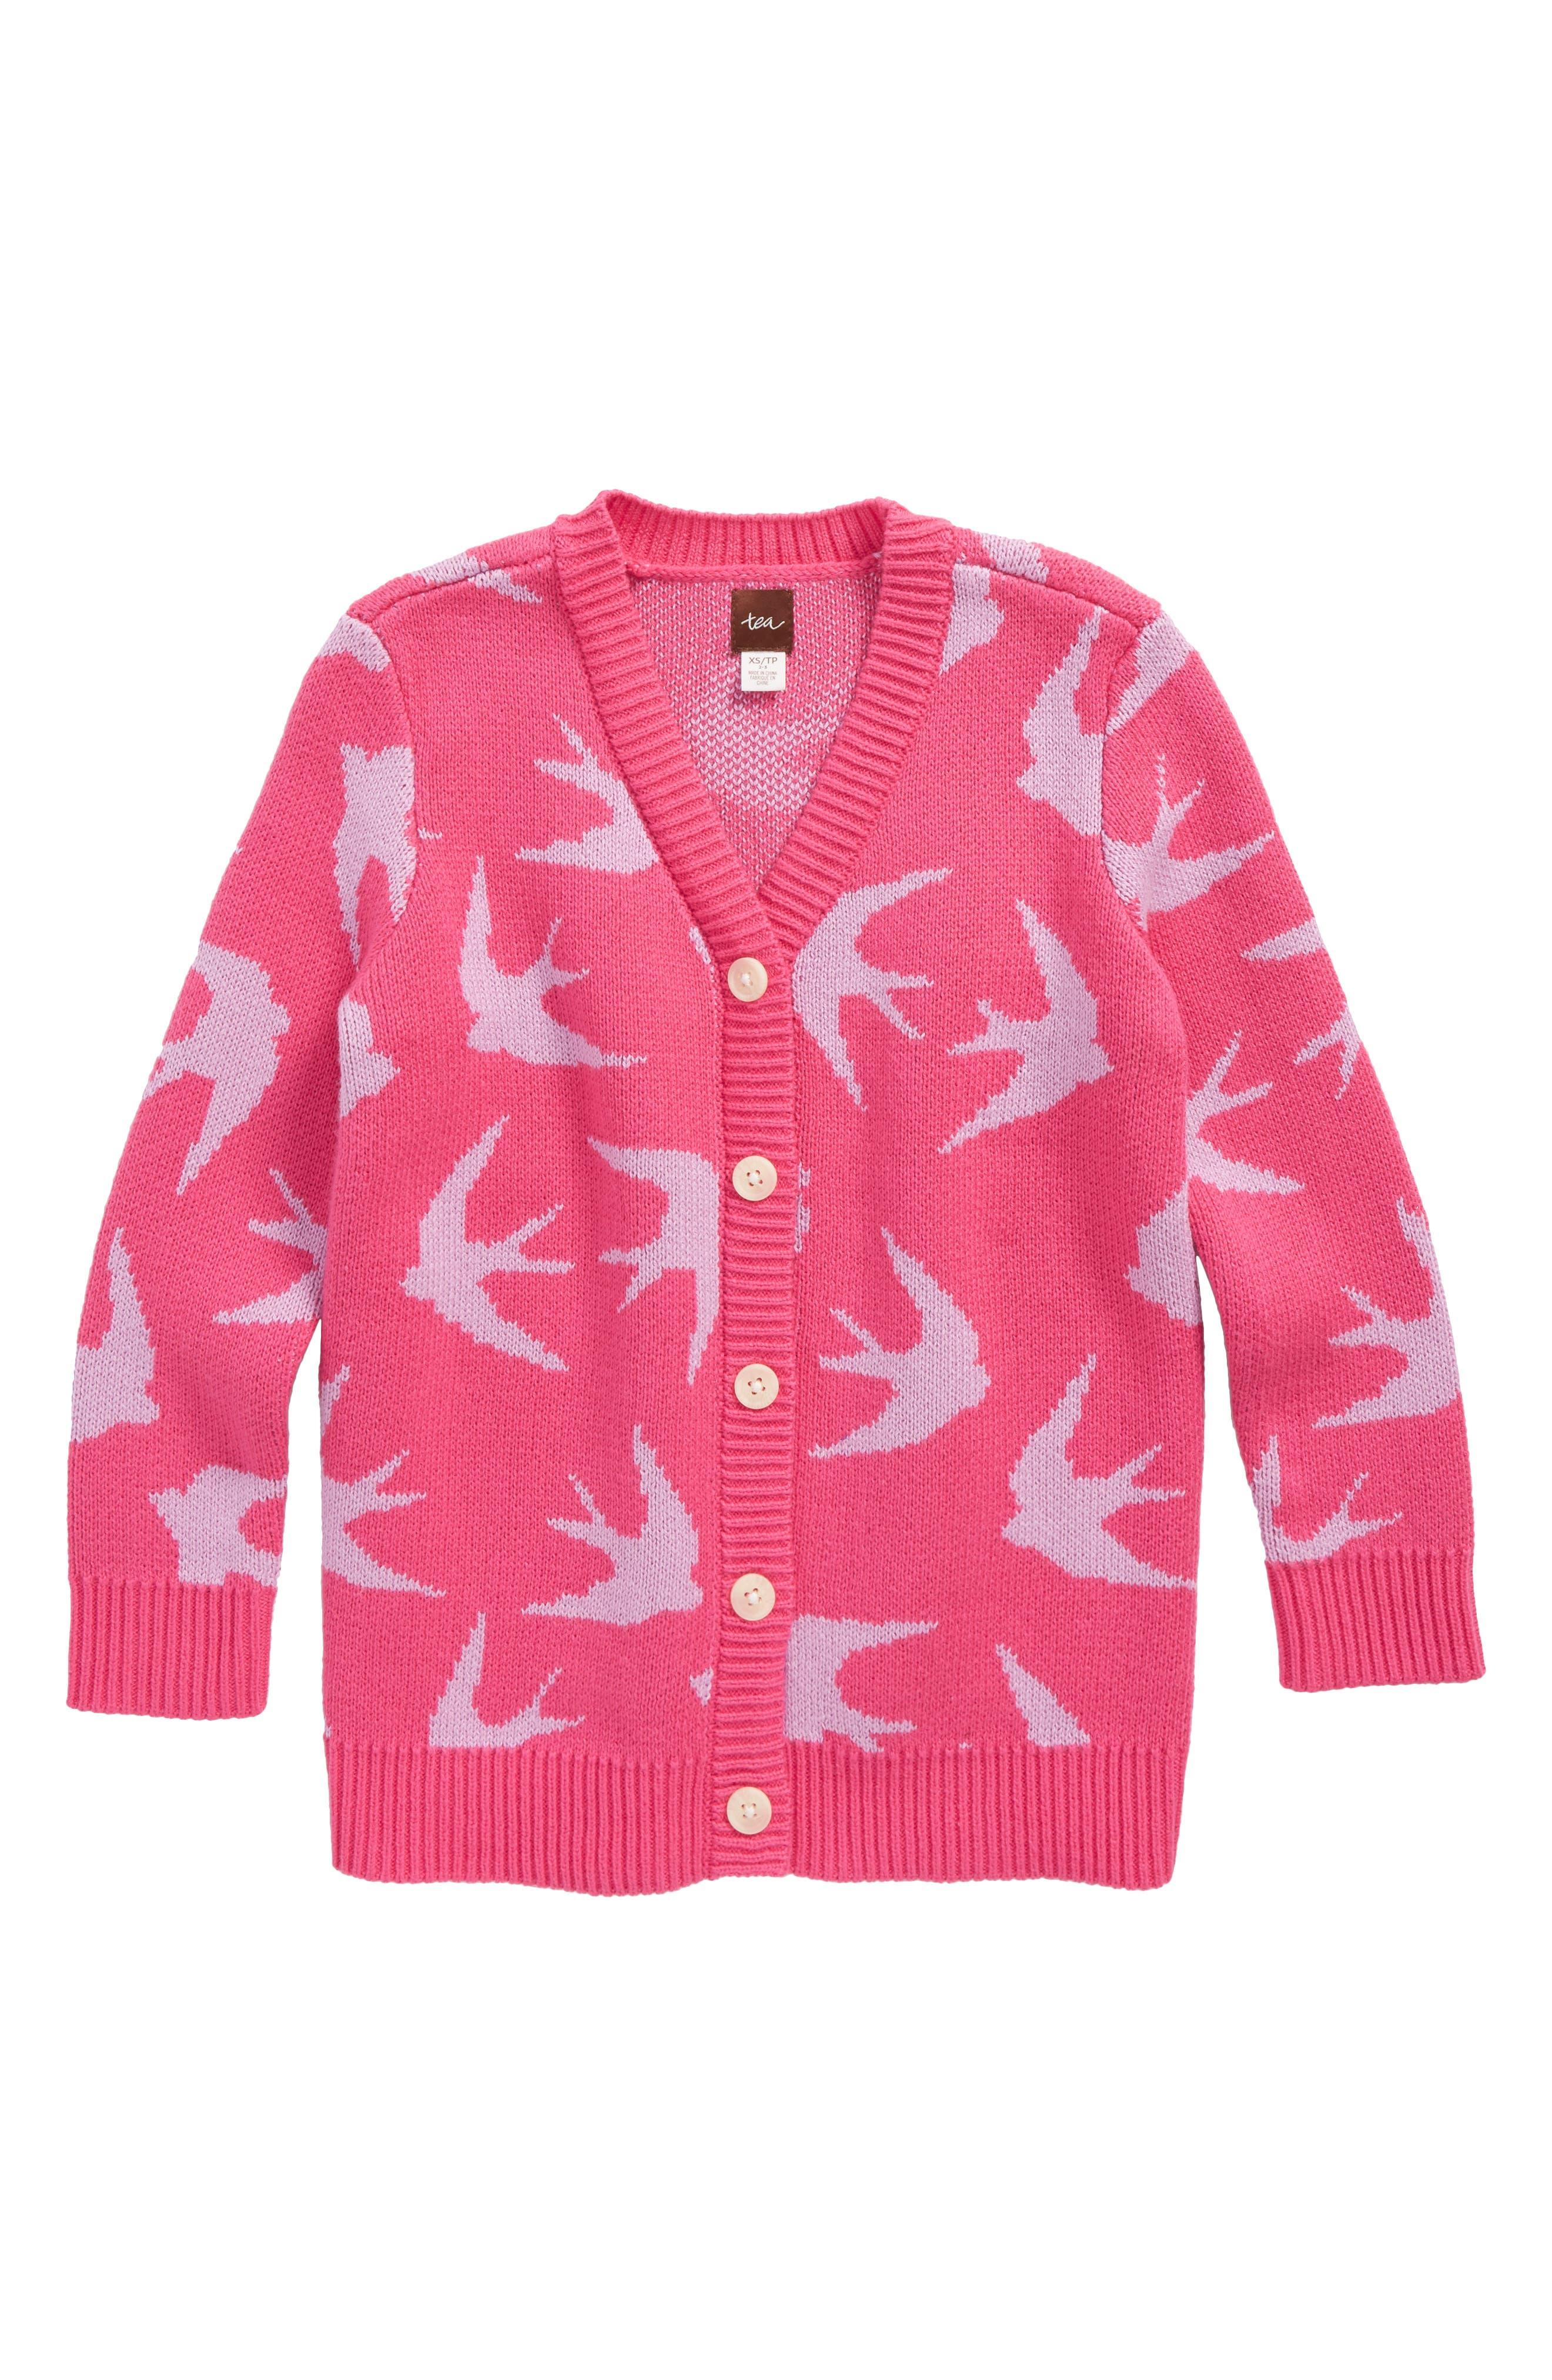 Tea Collection Snow Bunting Intarsia Knit Cardigan (Toddler Girls, Little Girls & Big Girls)